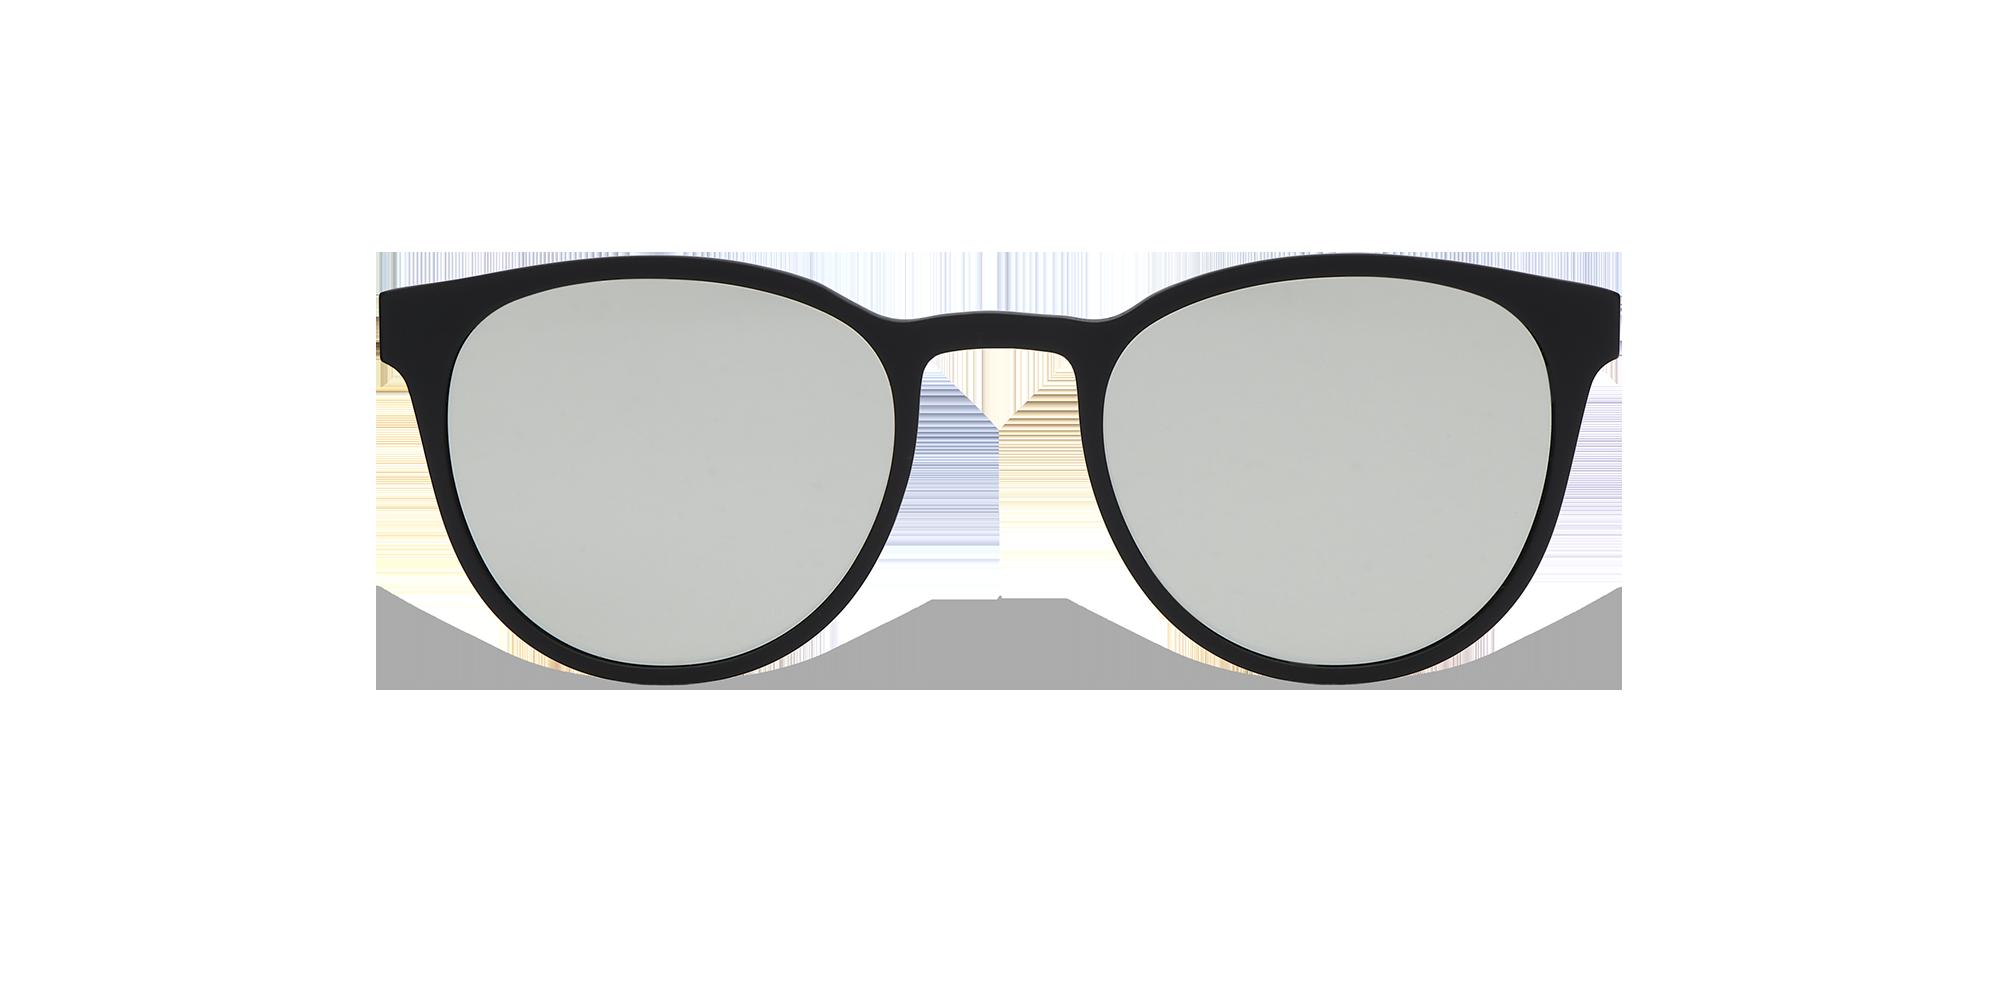 afflelou/france/products/smart_clip/clips_glasses/TMK44R3BK014920.png